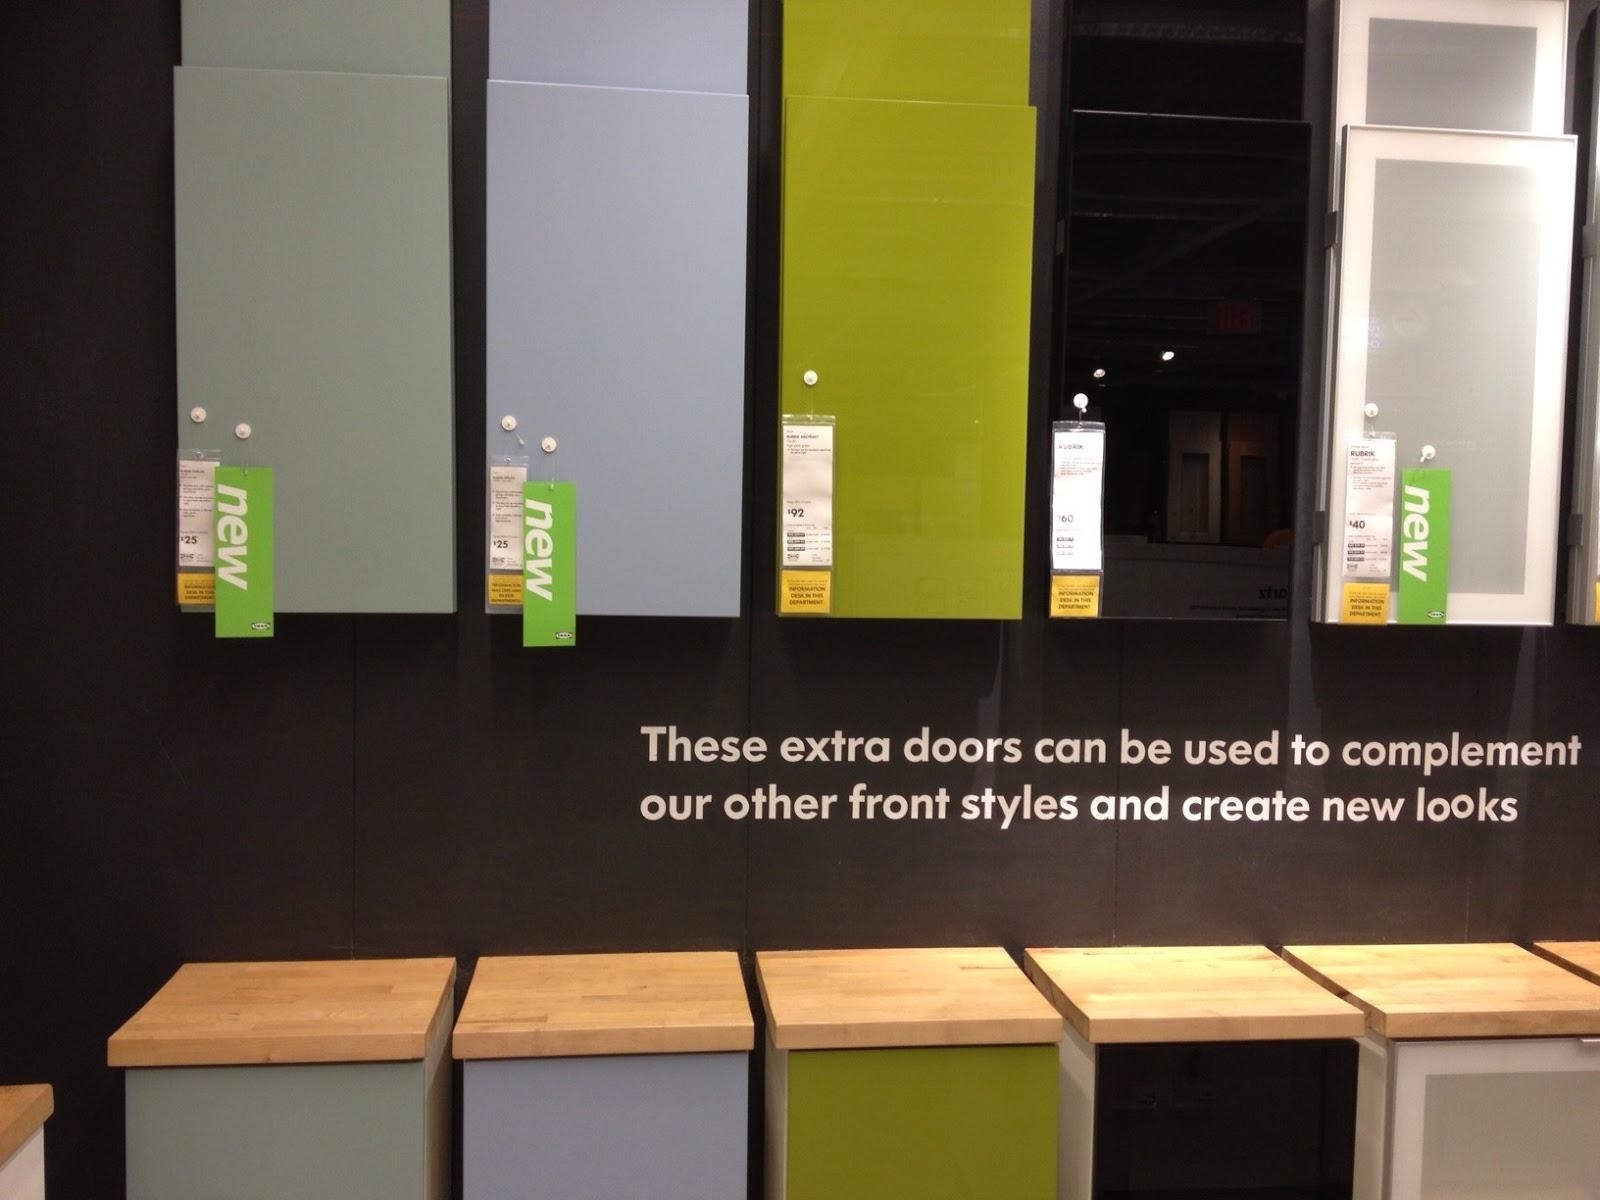 ikea kitchen cabinets door lineup kitchen cabinets ikea IKEA Kitchen Cabinets the Door lineup